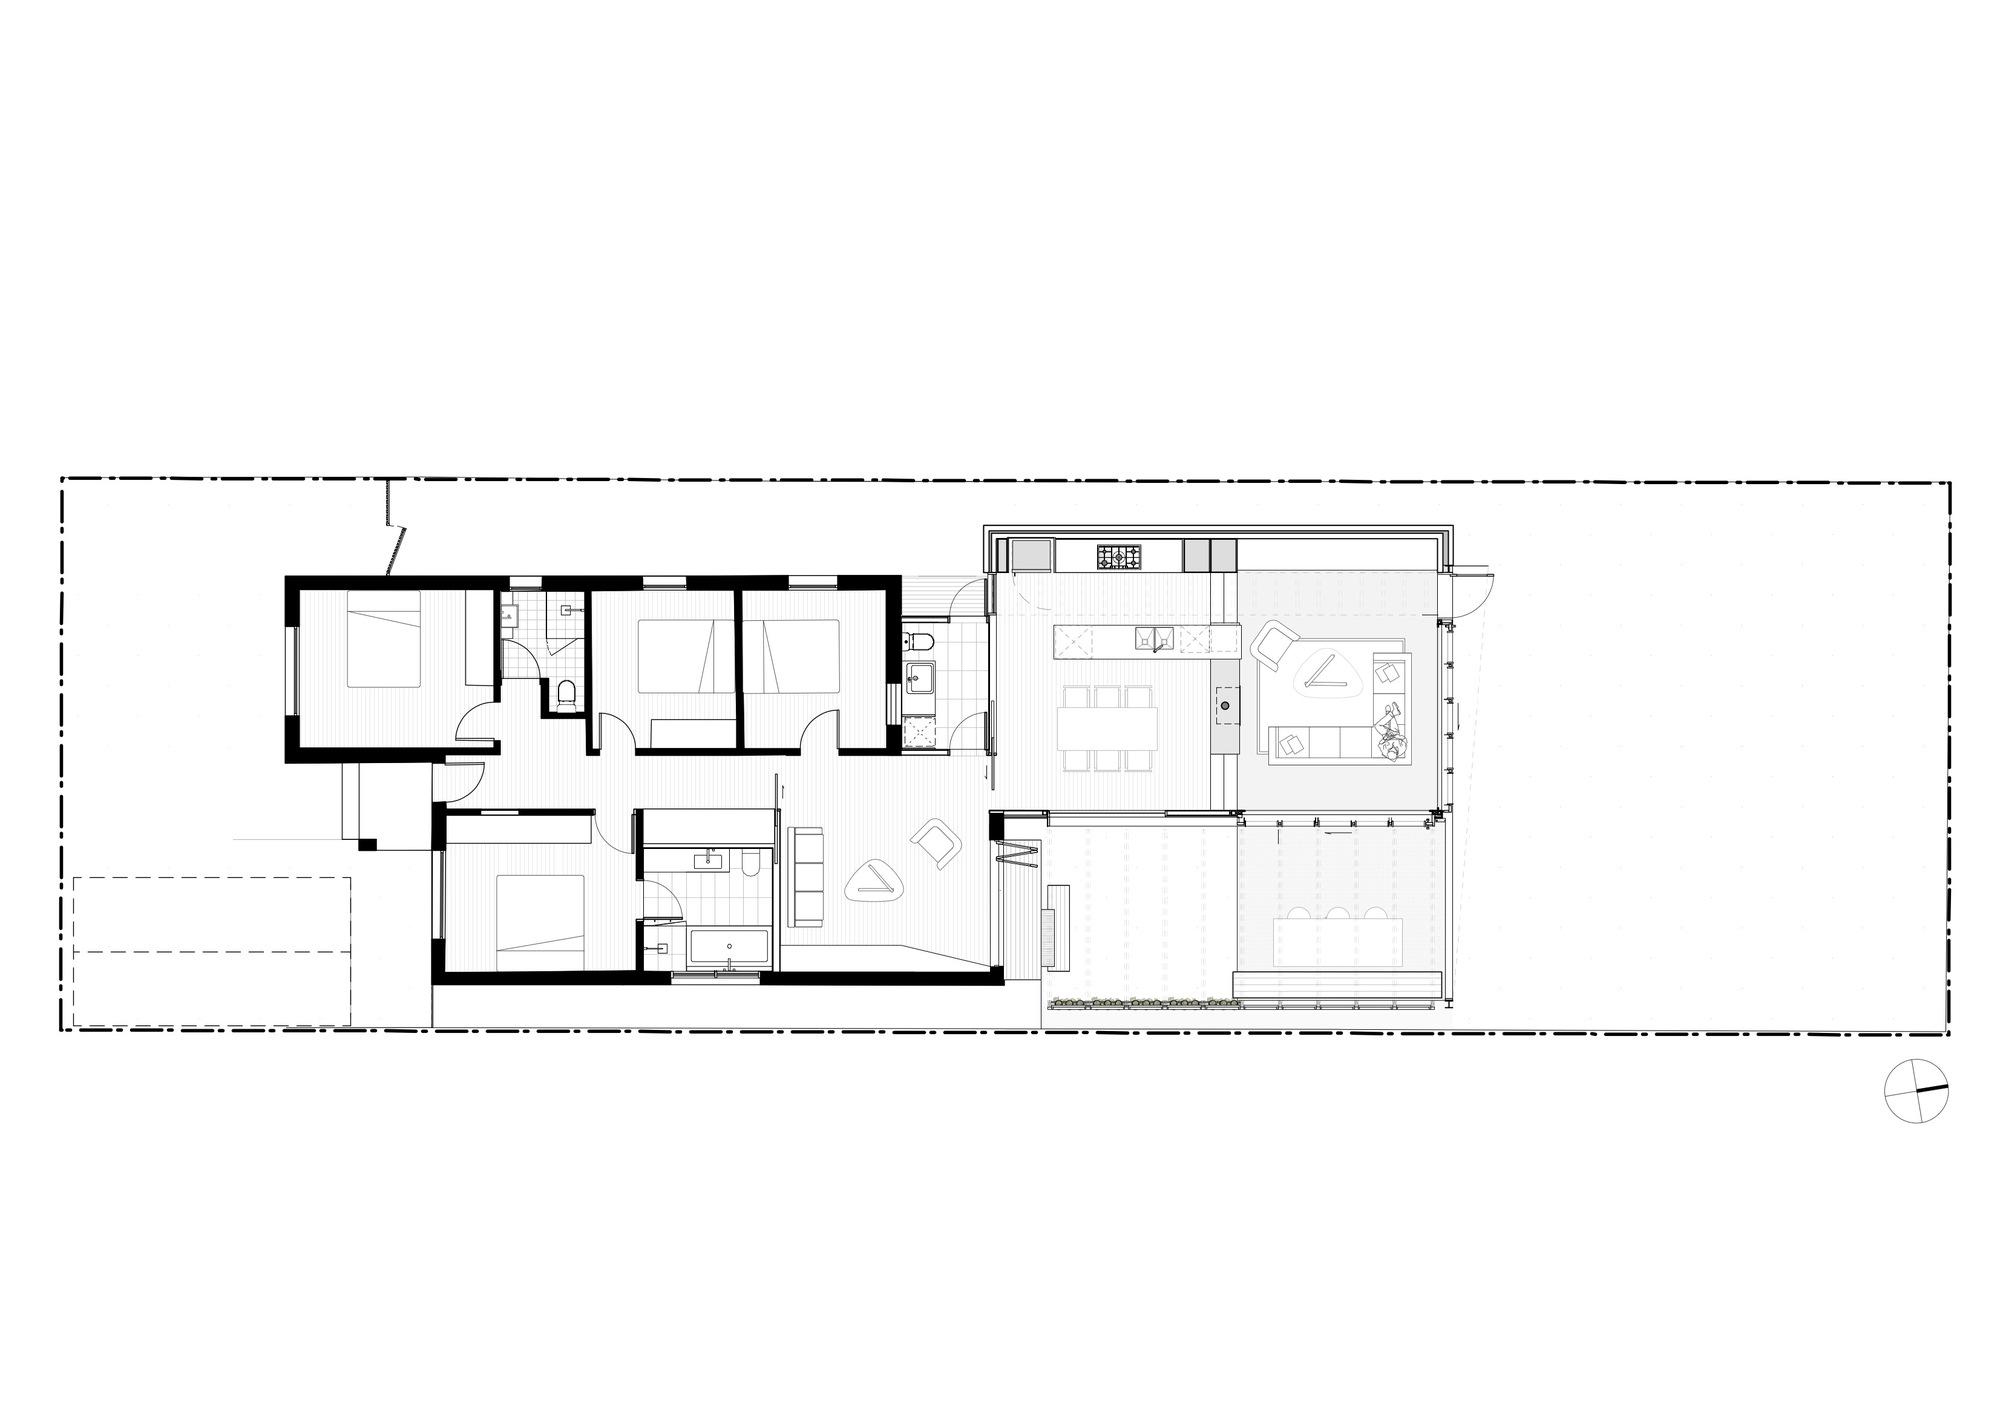 Gallery Of Sliding Doors Cplusc Architectural Workshop 15